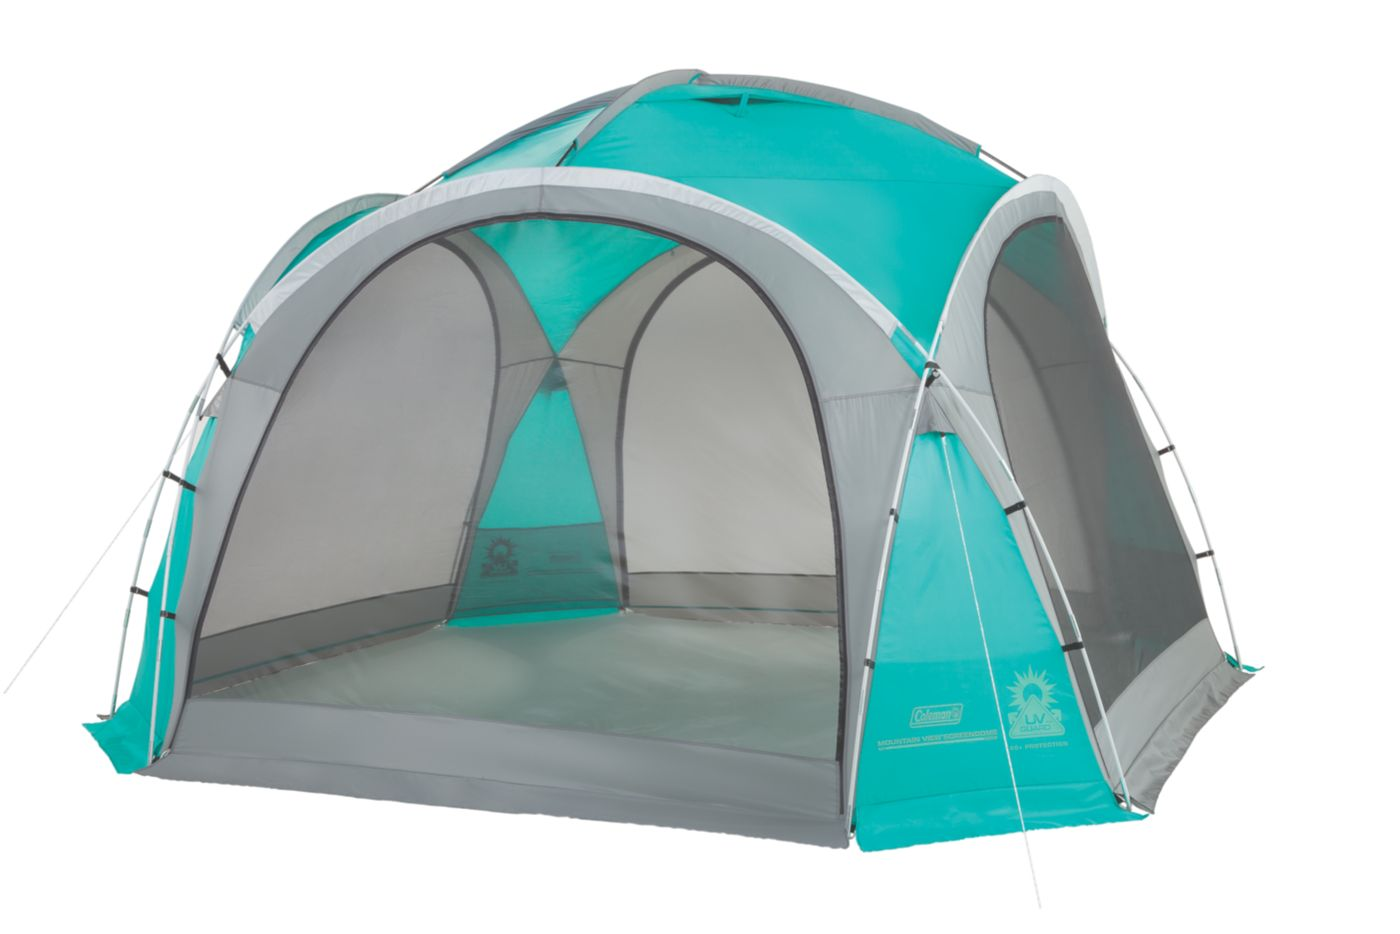 Mountain View™ 12 X 12 Screendome Shelter